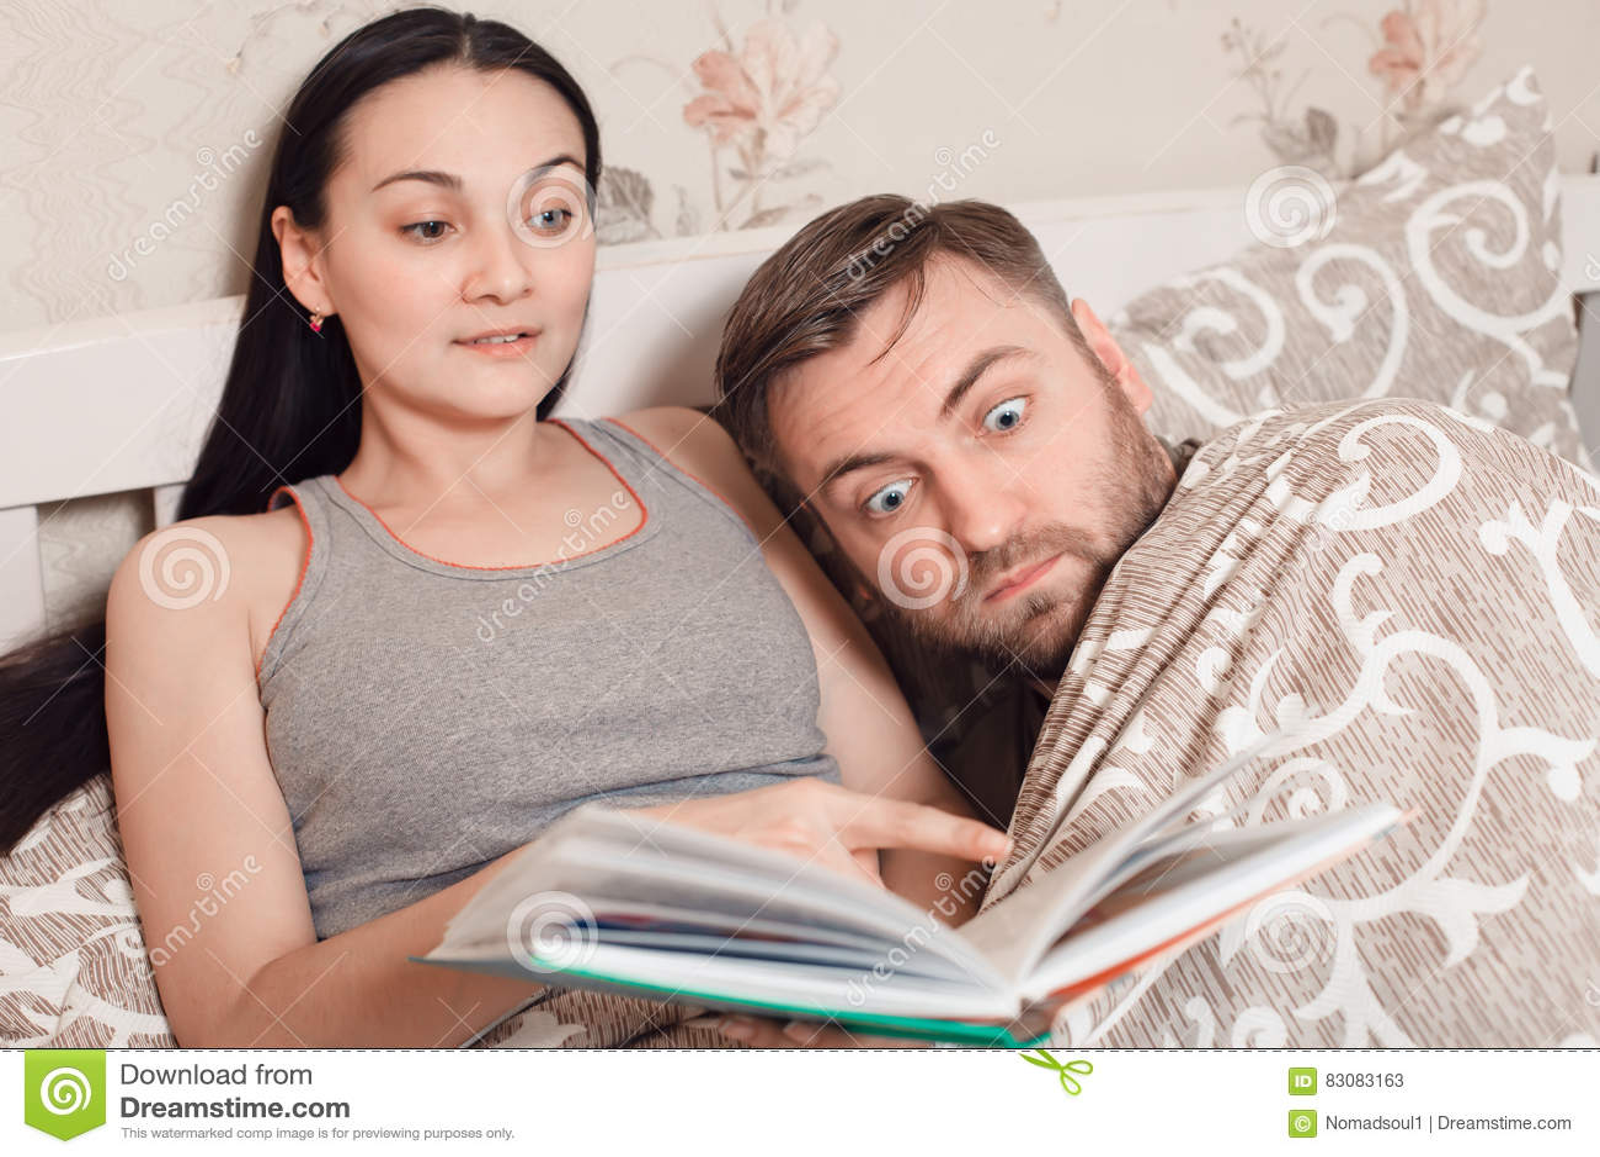 Ehe nicht aus ep 9 roher dailymotion